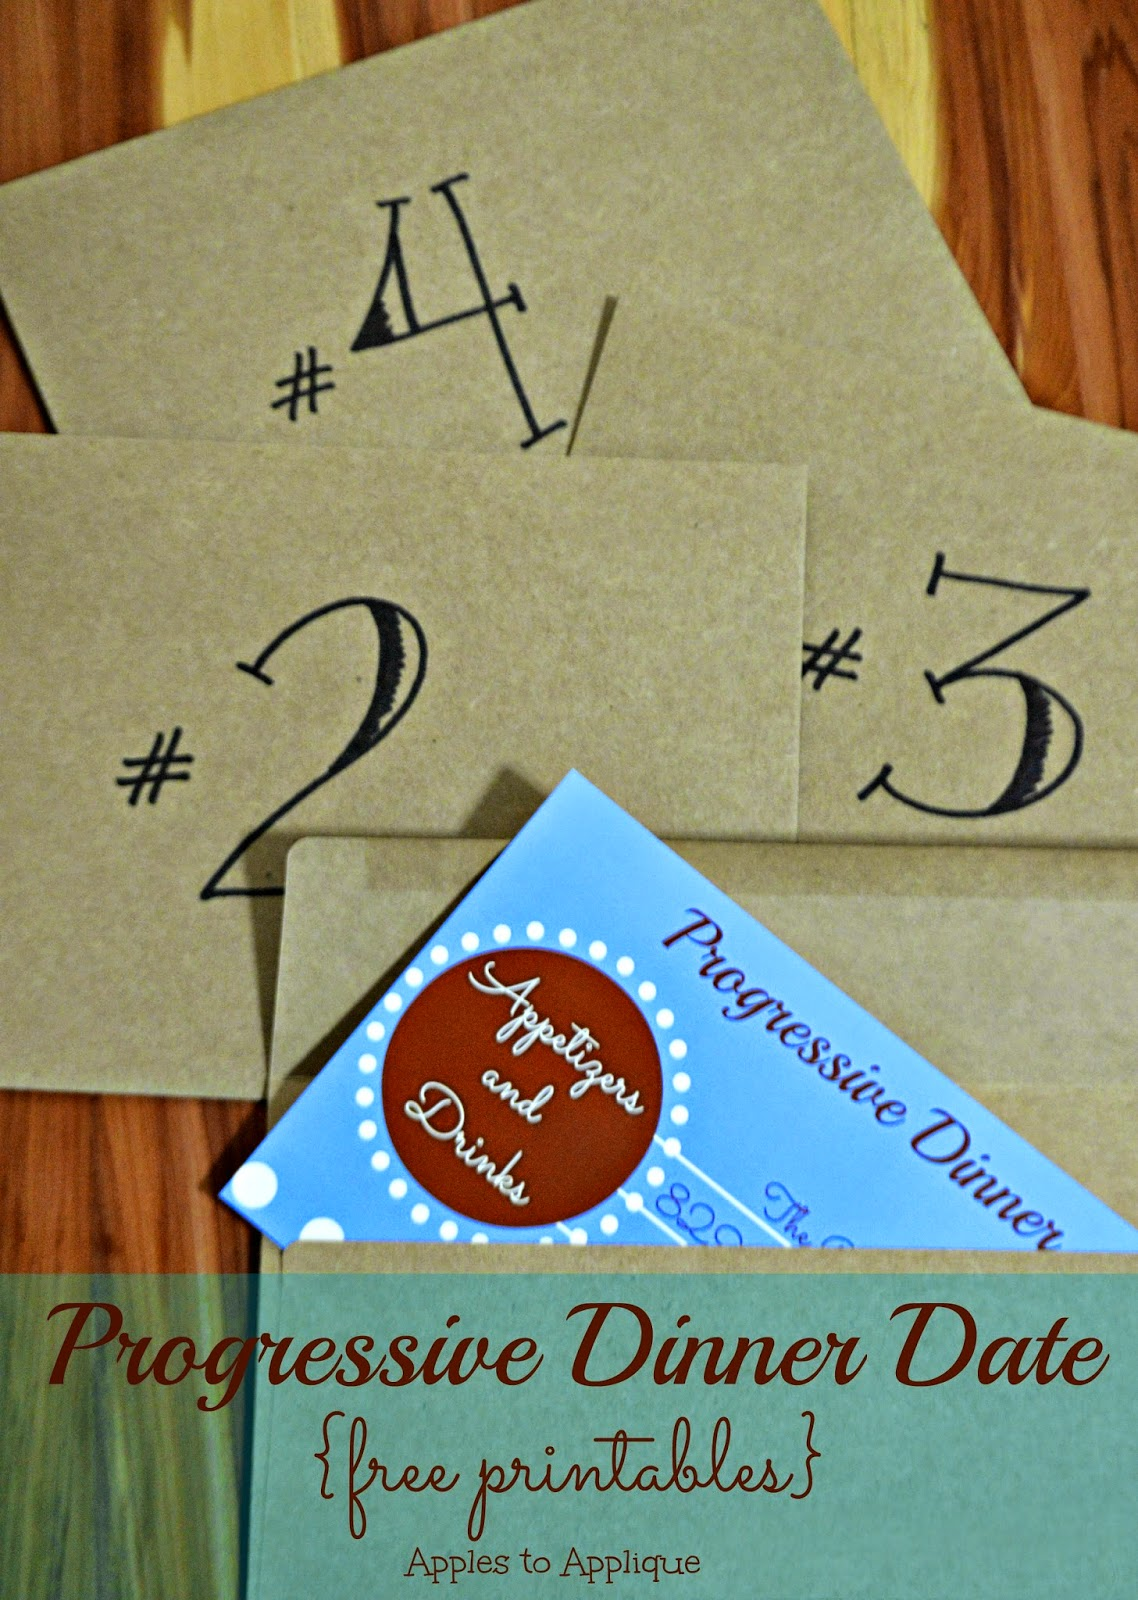 Progressive Dinner Date {with free printables} | Apples to Applique #datenight #dateideas